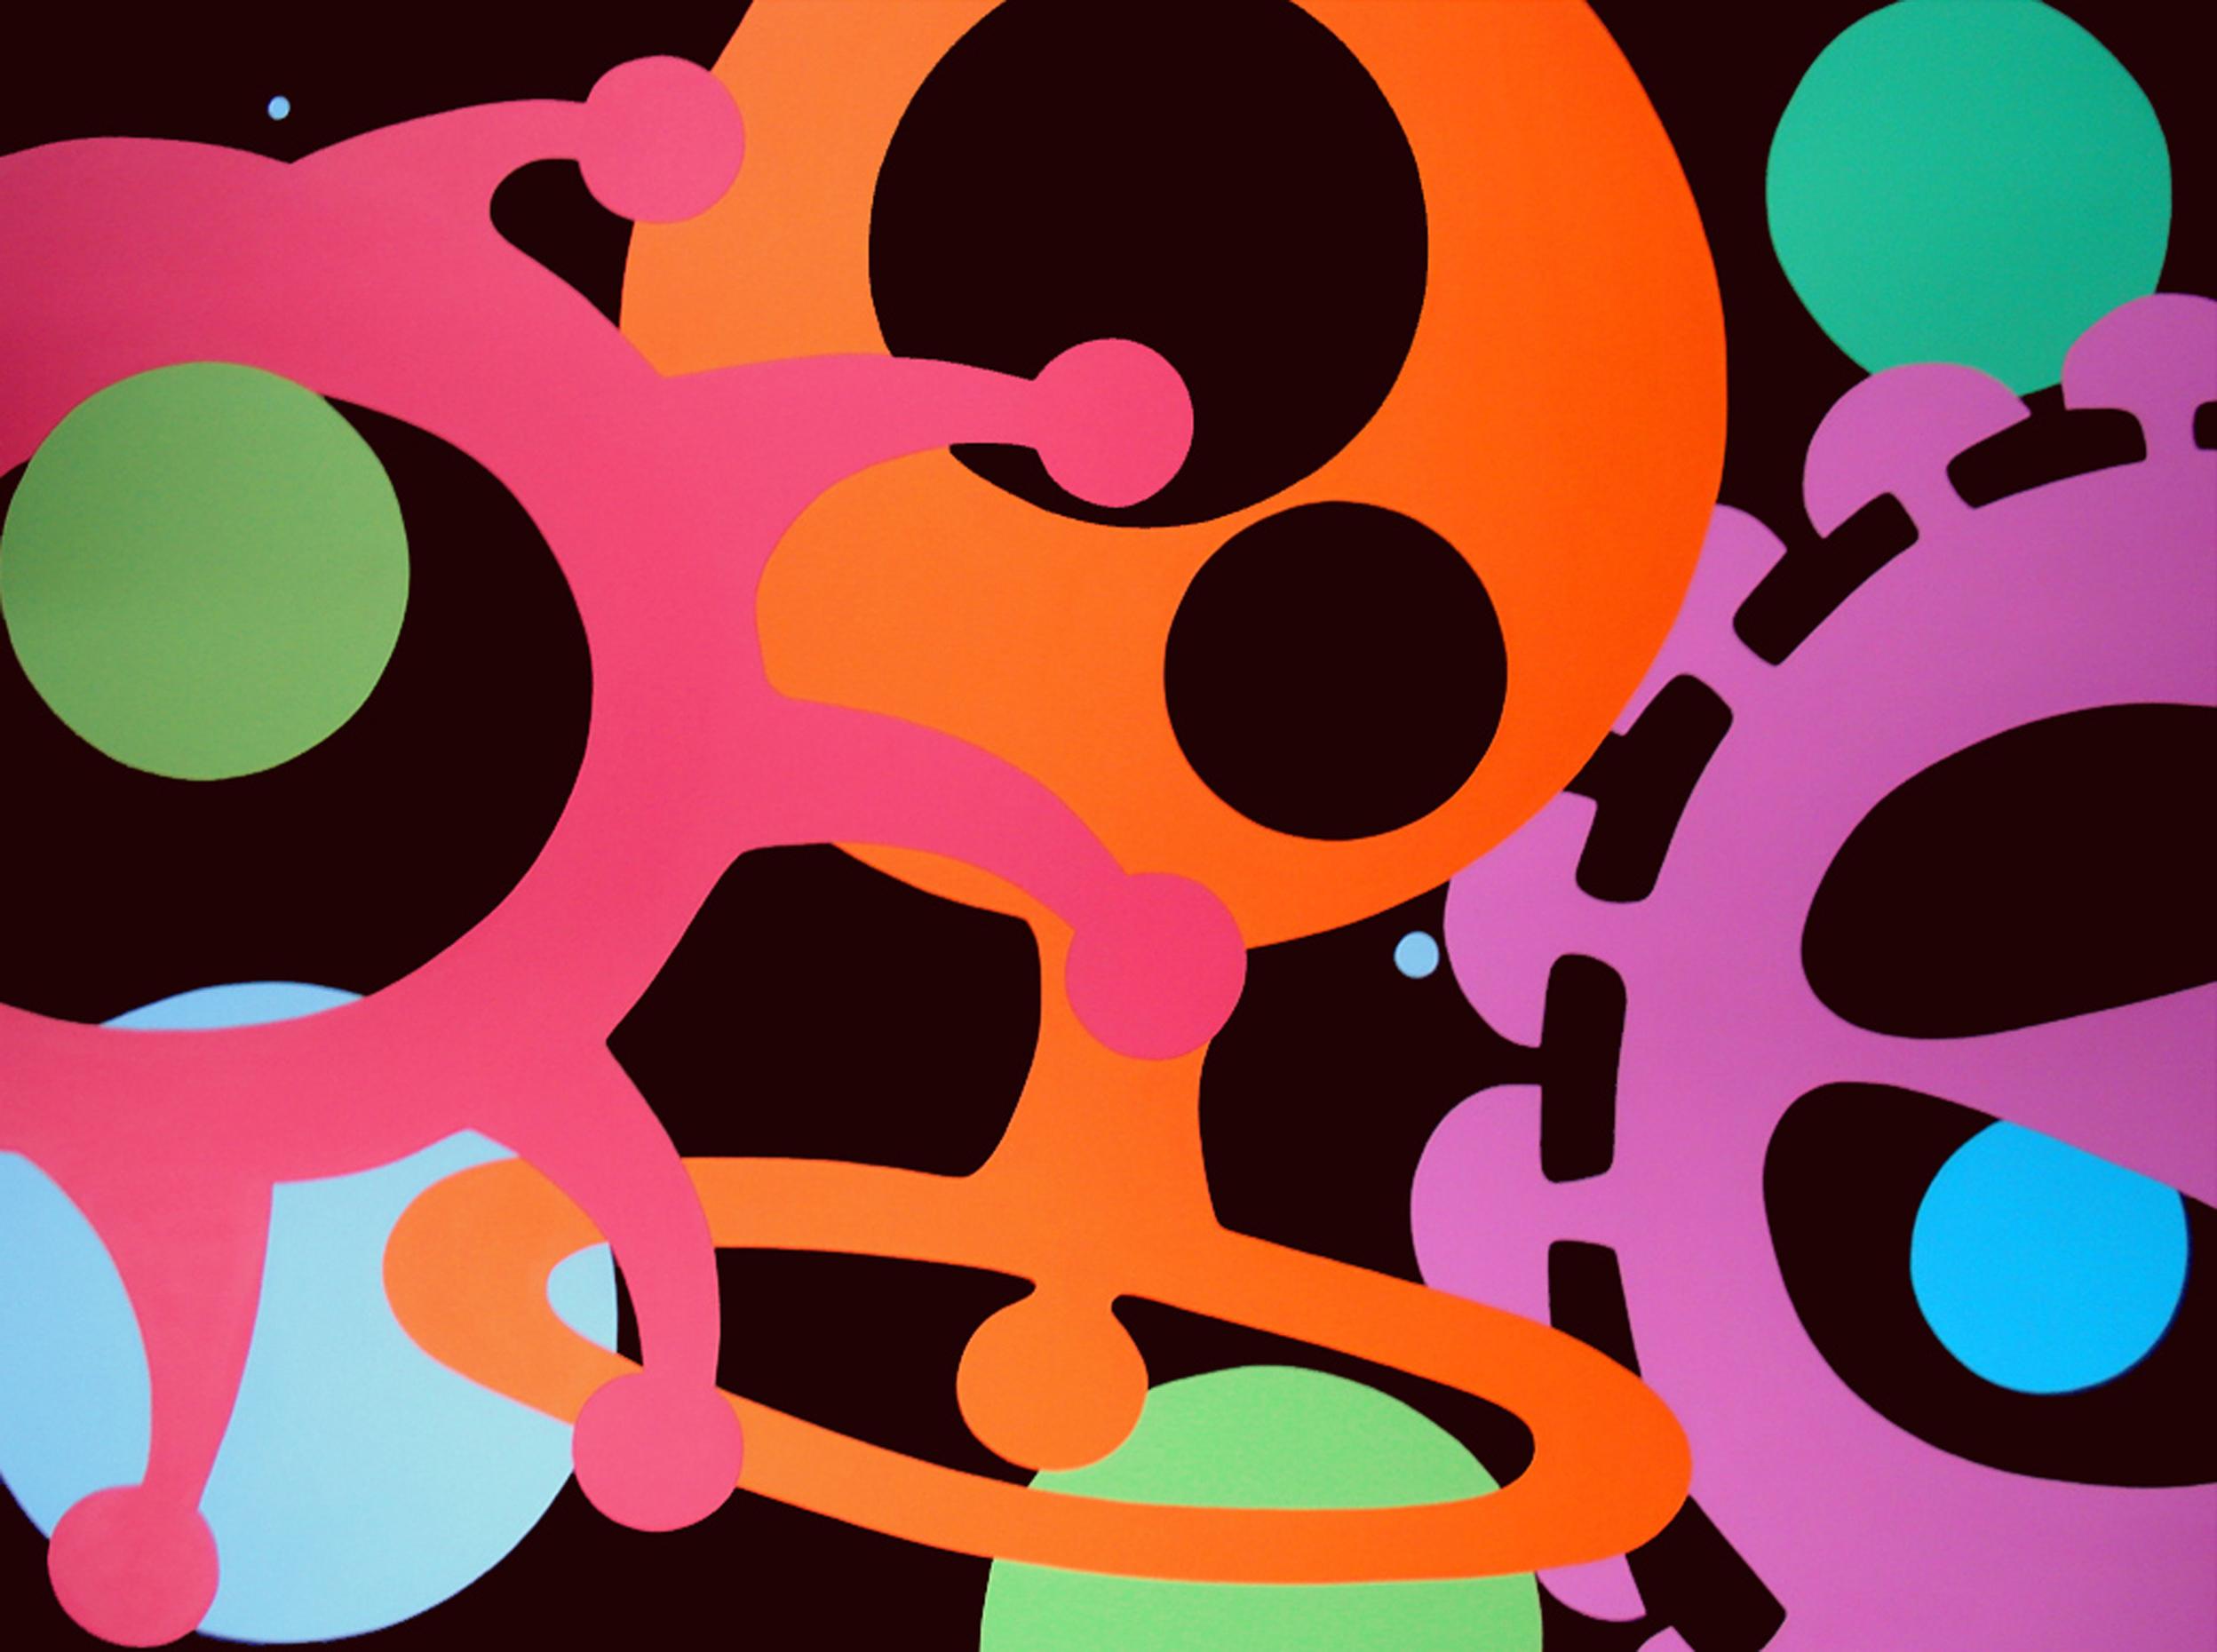 Beyond the Visible (abstract pop painting) Philippe Sokazo & Lines at Play (abstract painting) Ellen Bang